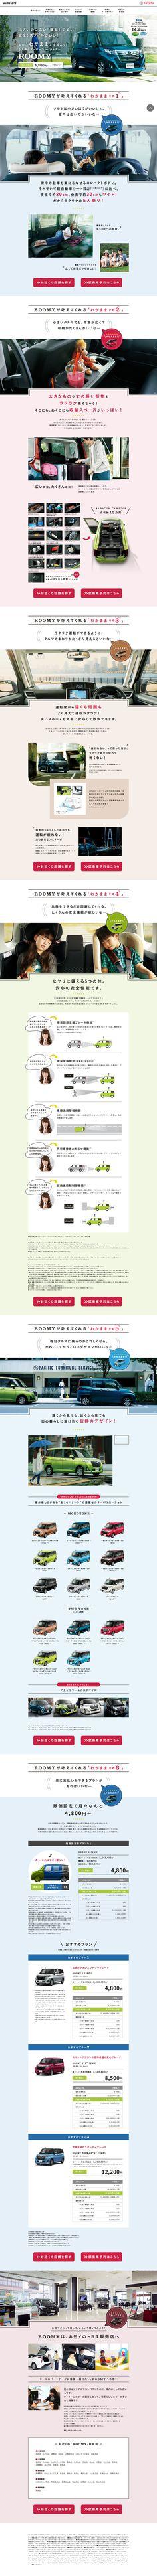 ROOMY 特設サイト http://www.tokyotoyota.co.jp/lp1/